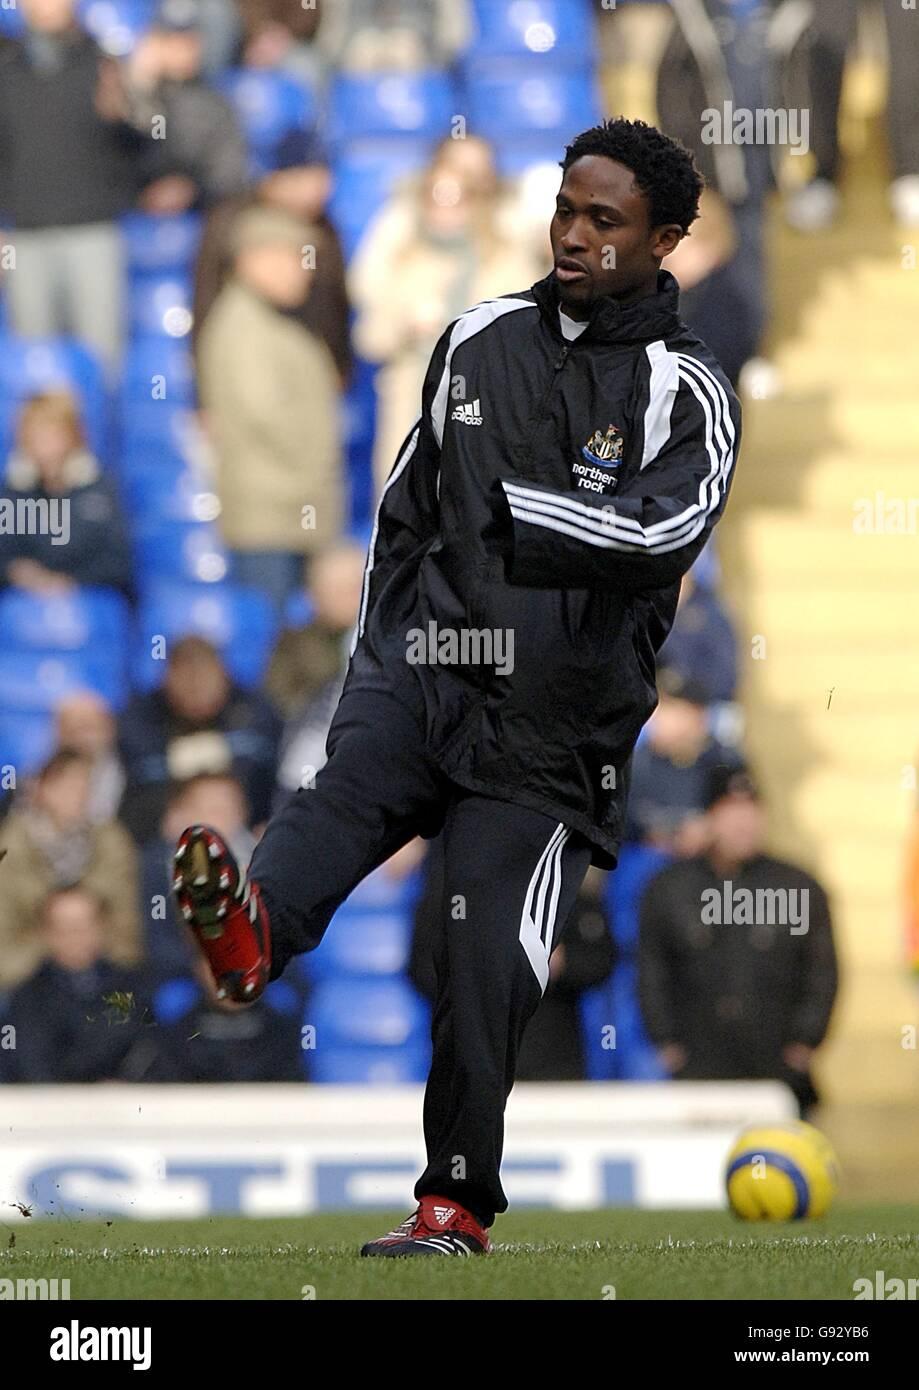 Soccer - FA Barclays Premiership - Tottenham Hotspur v Newcastle United - White Hart Lane - Stock Image